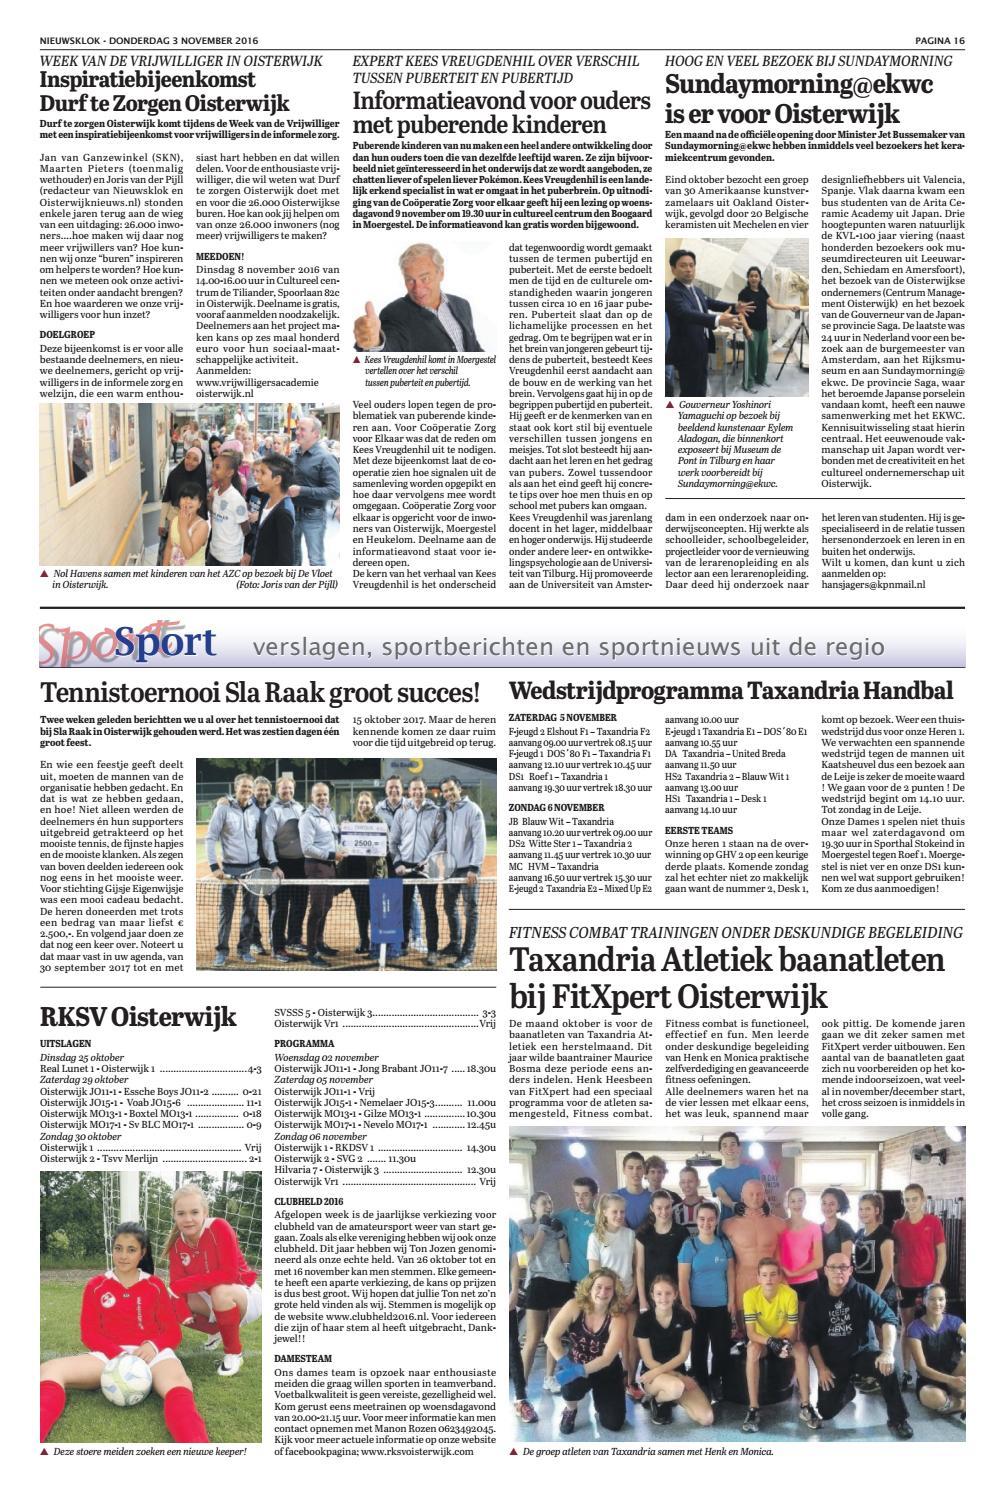 Nieuwsklok 03-11-2016 by Uitgeverij Em de Jong - issuu ab77c039eba1